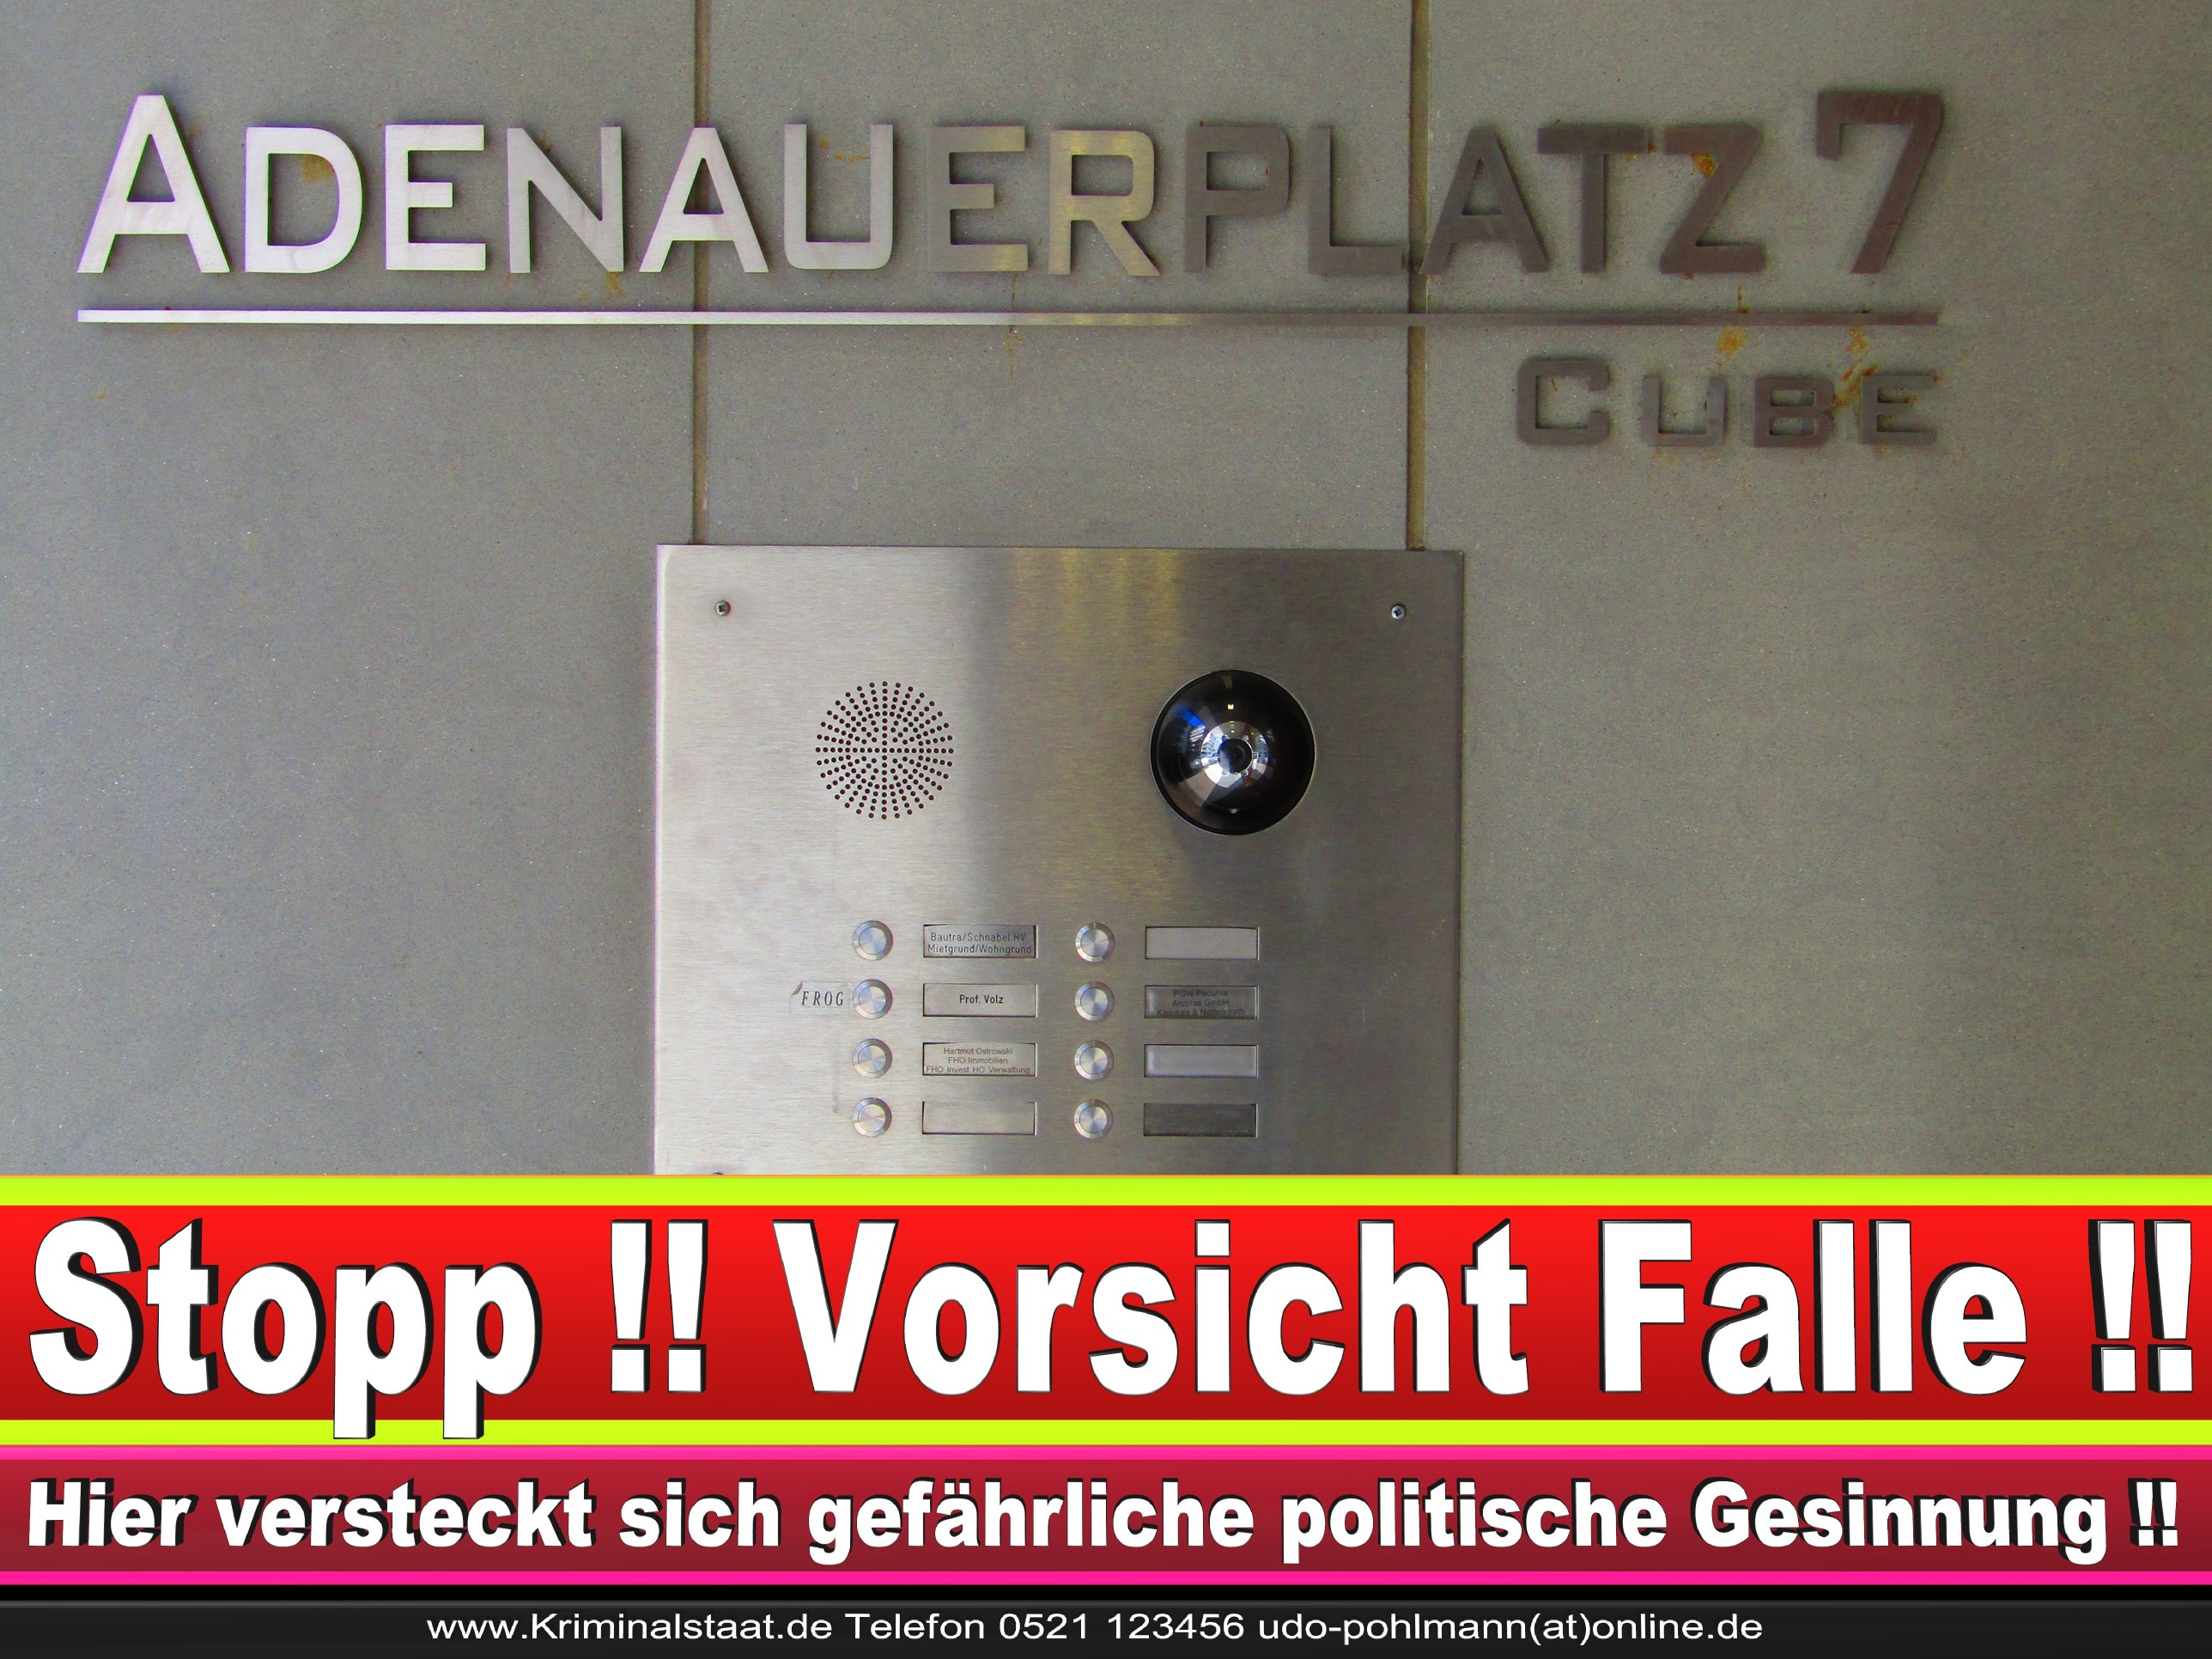 Rechtsanwalt Ralf Nettelstroth Adenauer Platz 7 Bielefeld CDU 8 Kopie